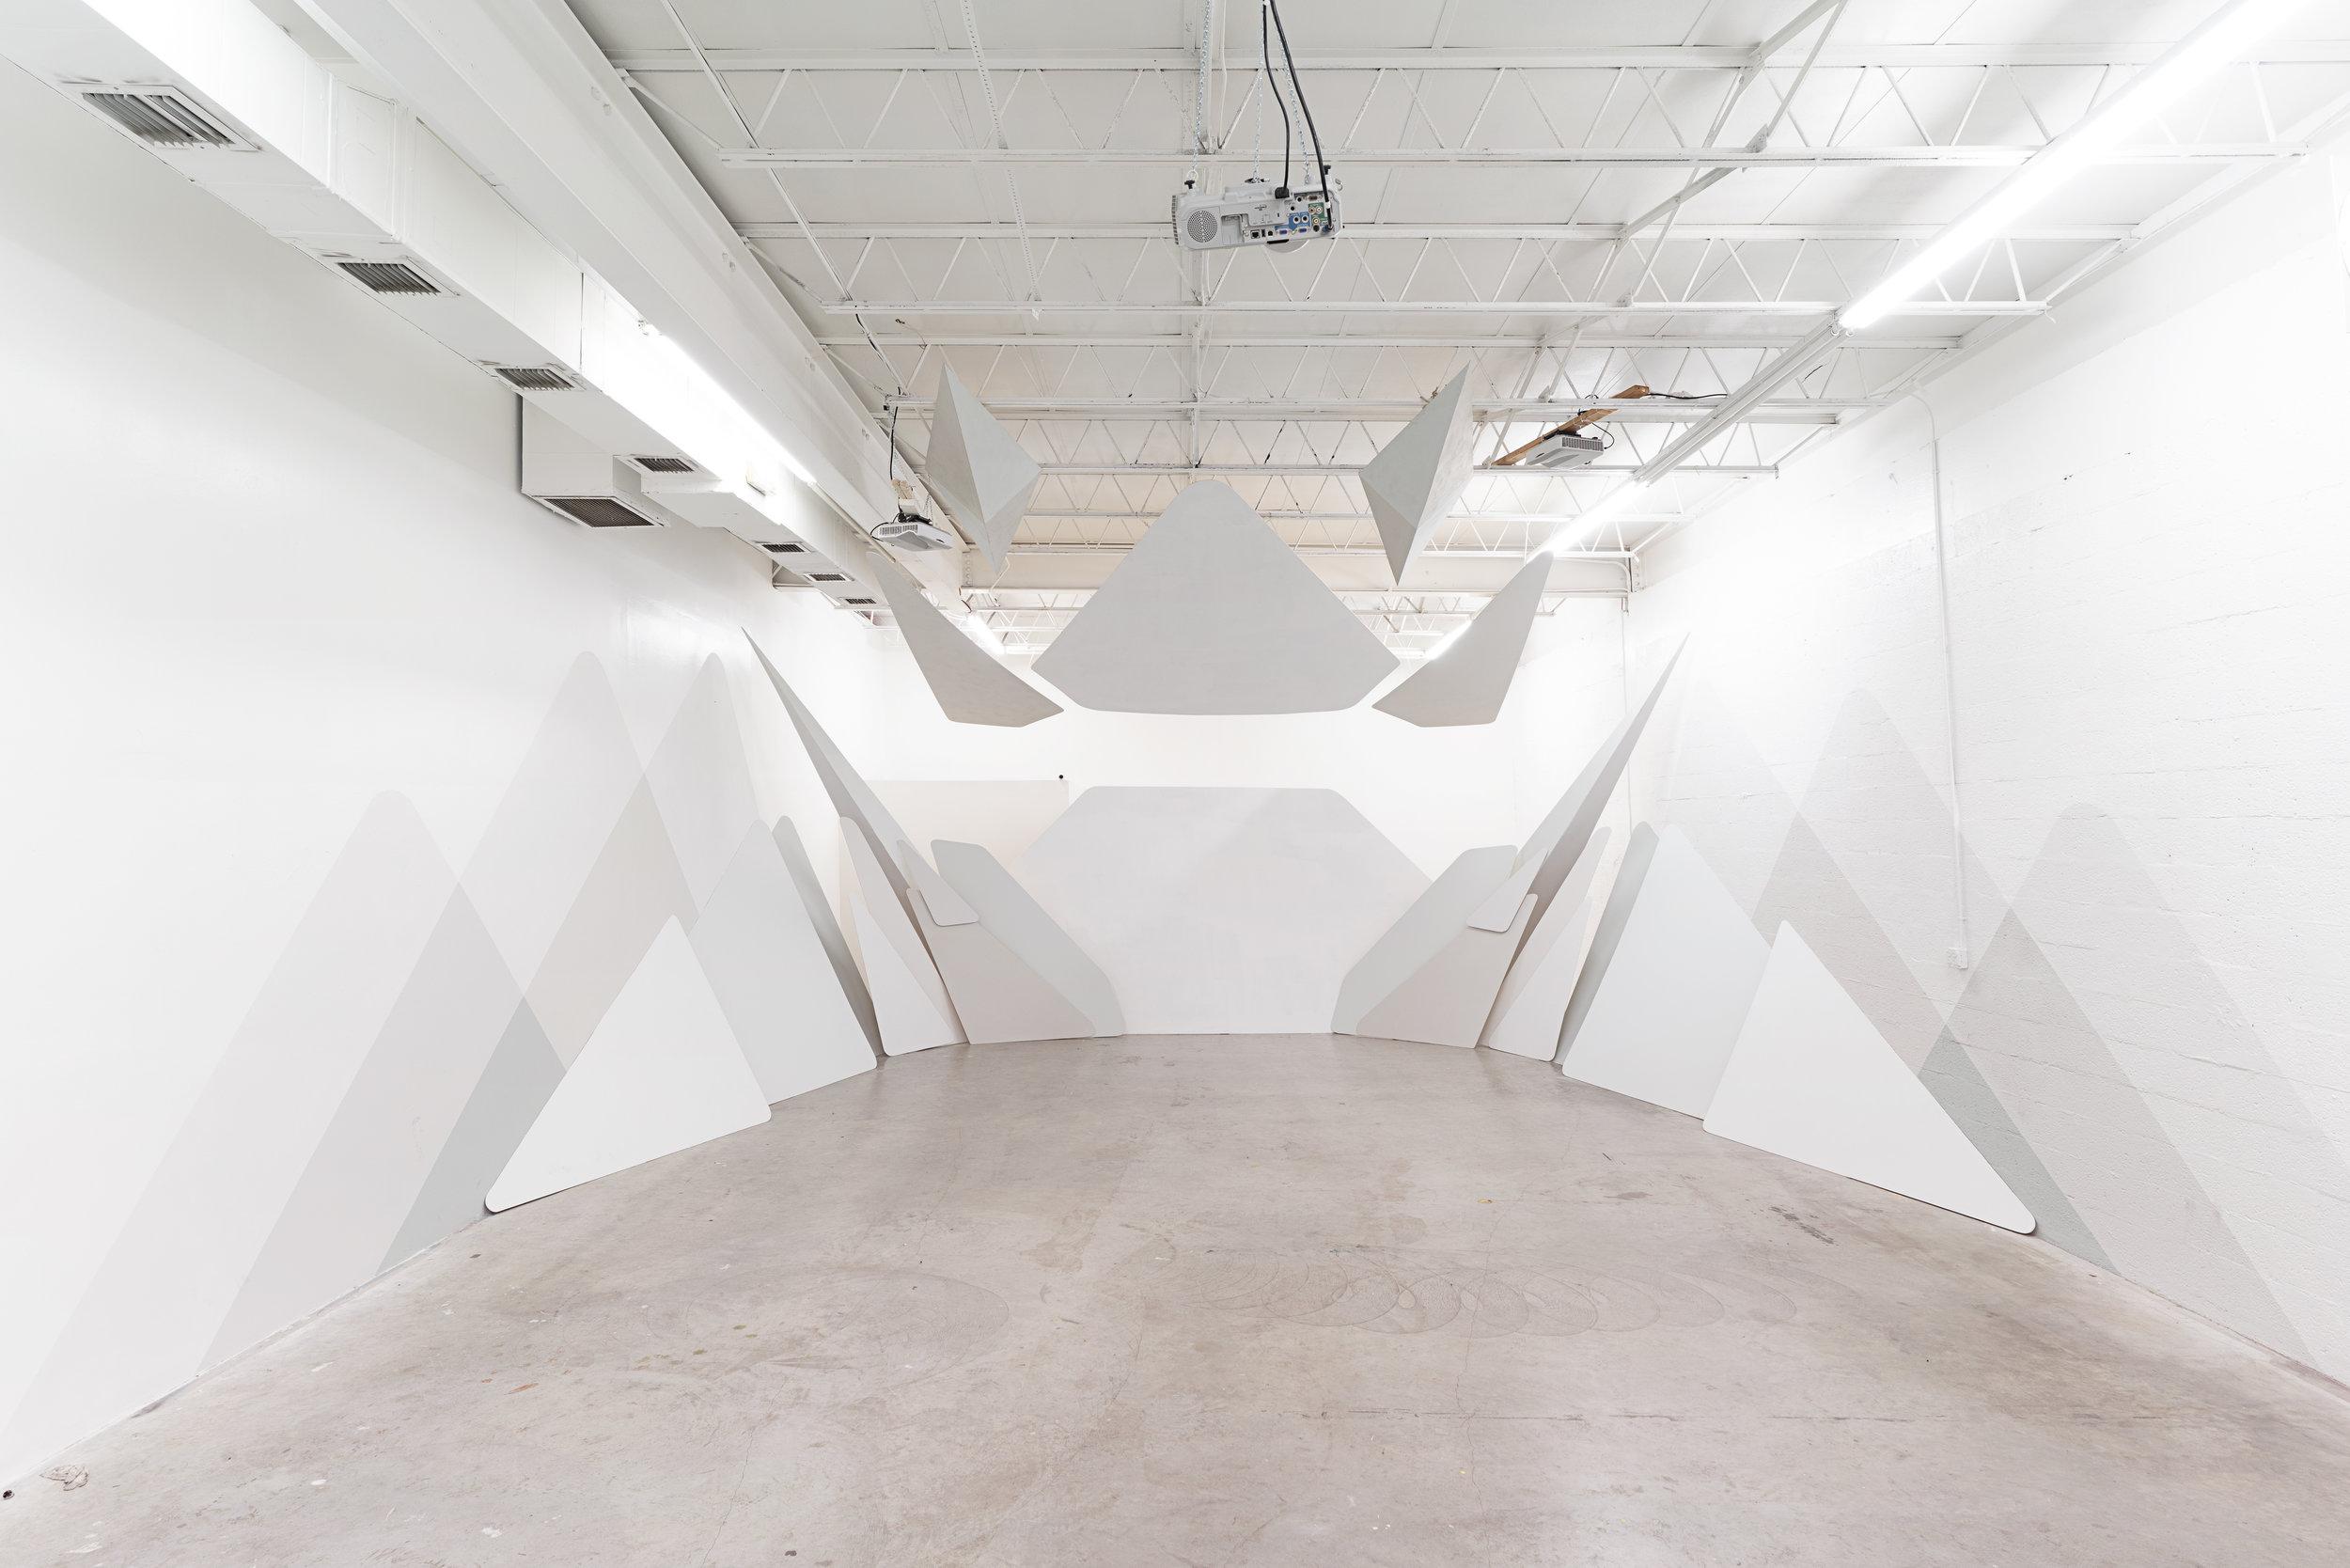 Base Reality, 2019, Solo Installation at Superchief Gallery, Miami, FL